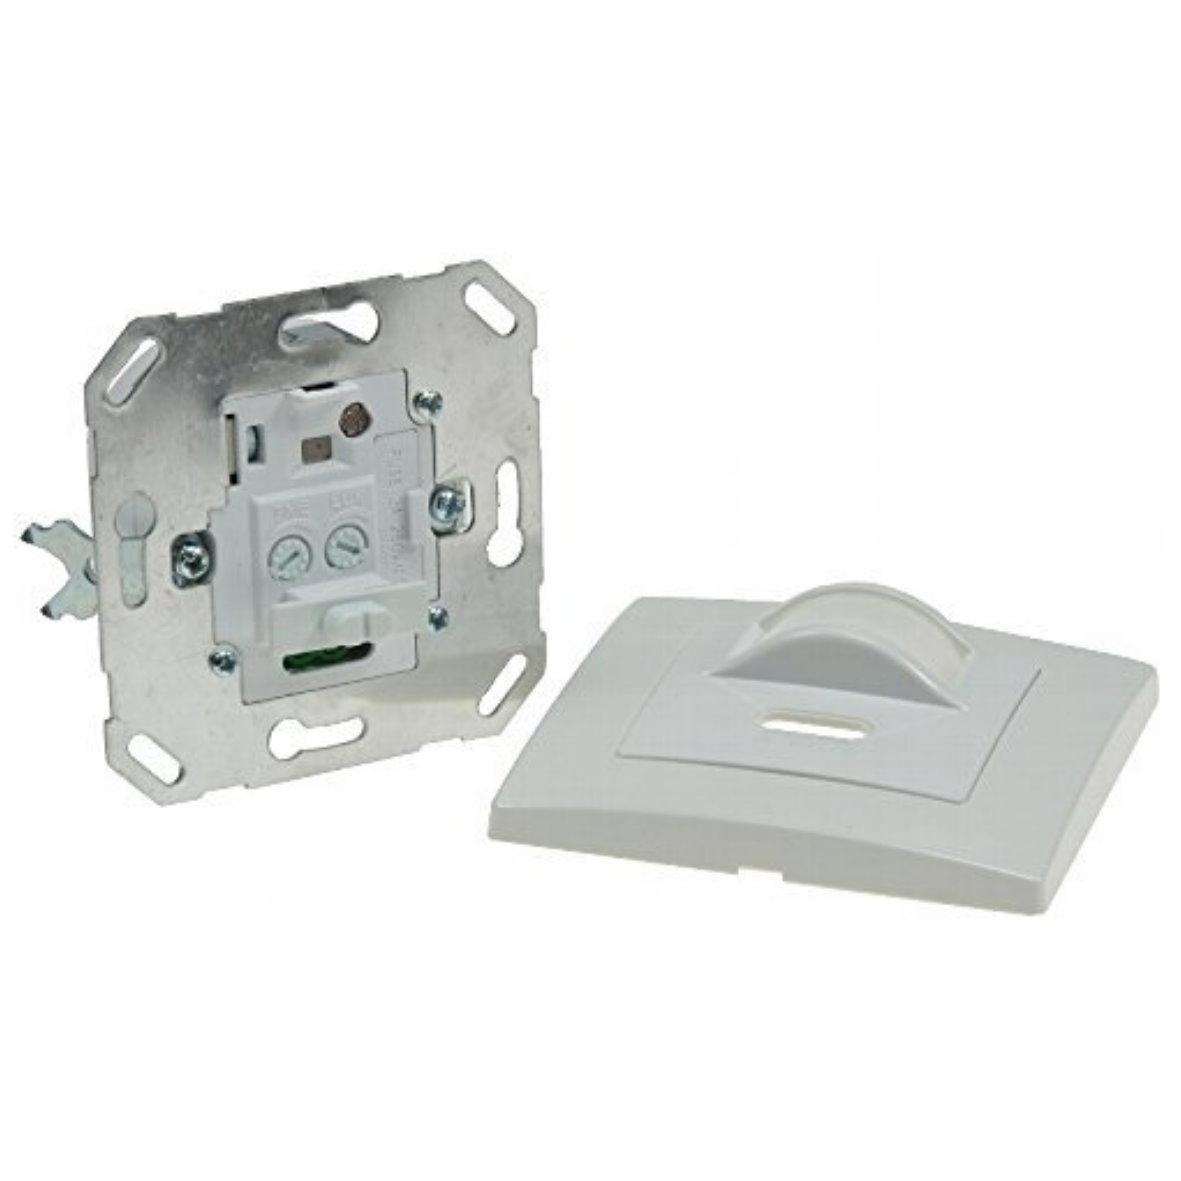 Einbau IR Bewegungsmelder 2-Draht - LED geeignet (21251)